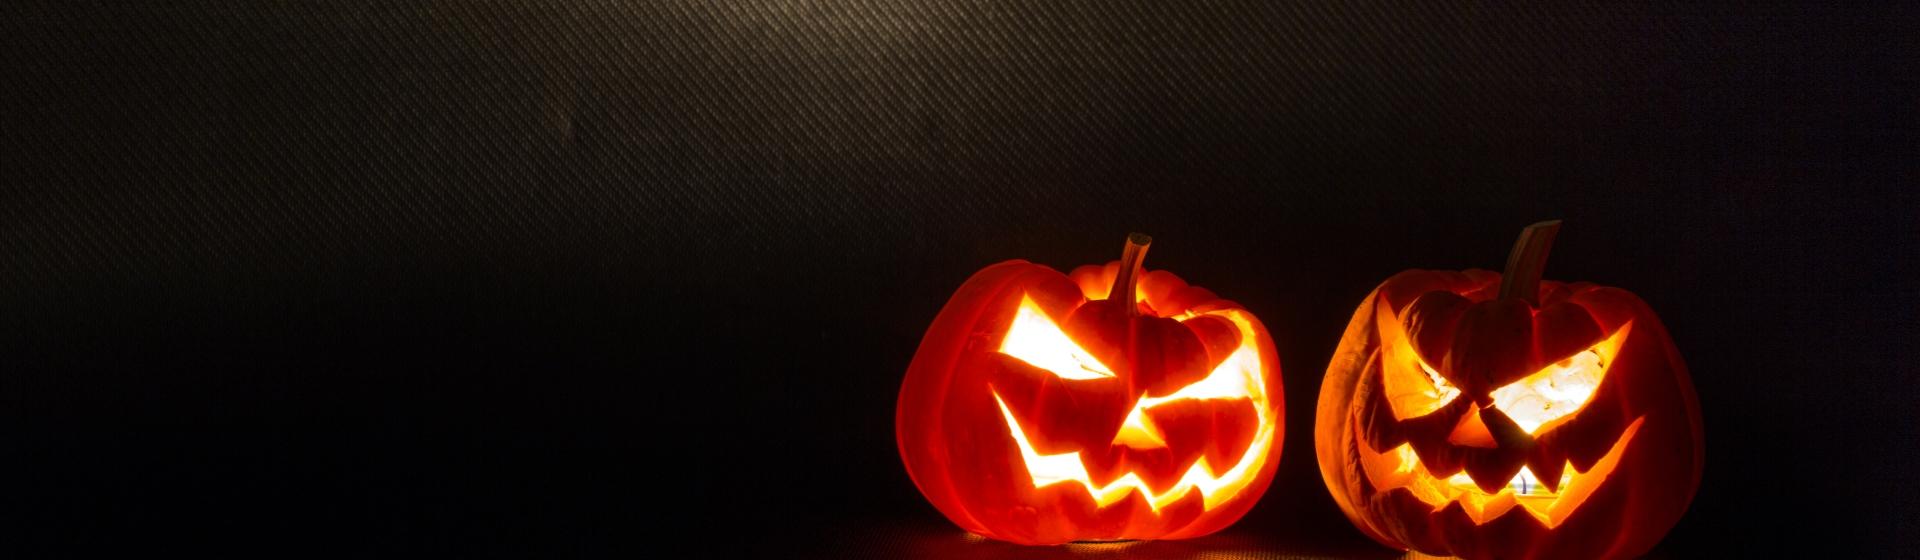 halloween, pumpkins, jack o lanterns, holidays,